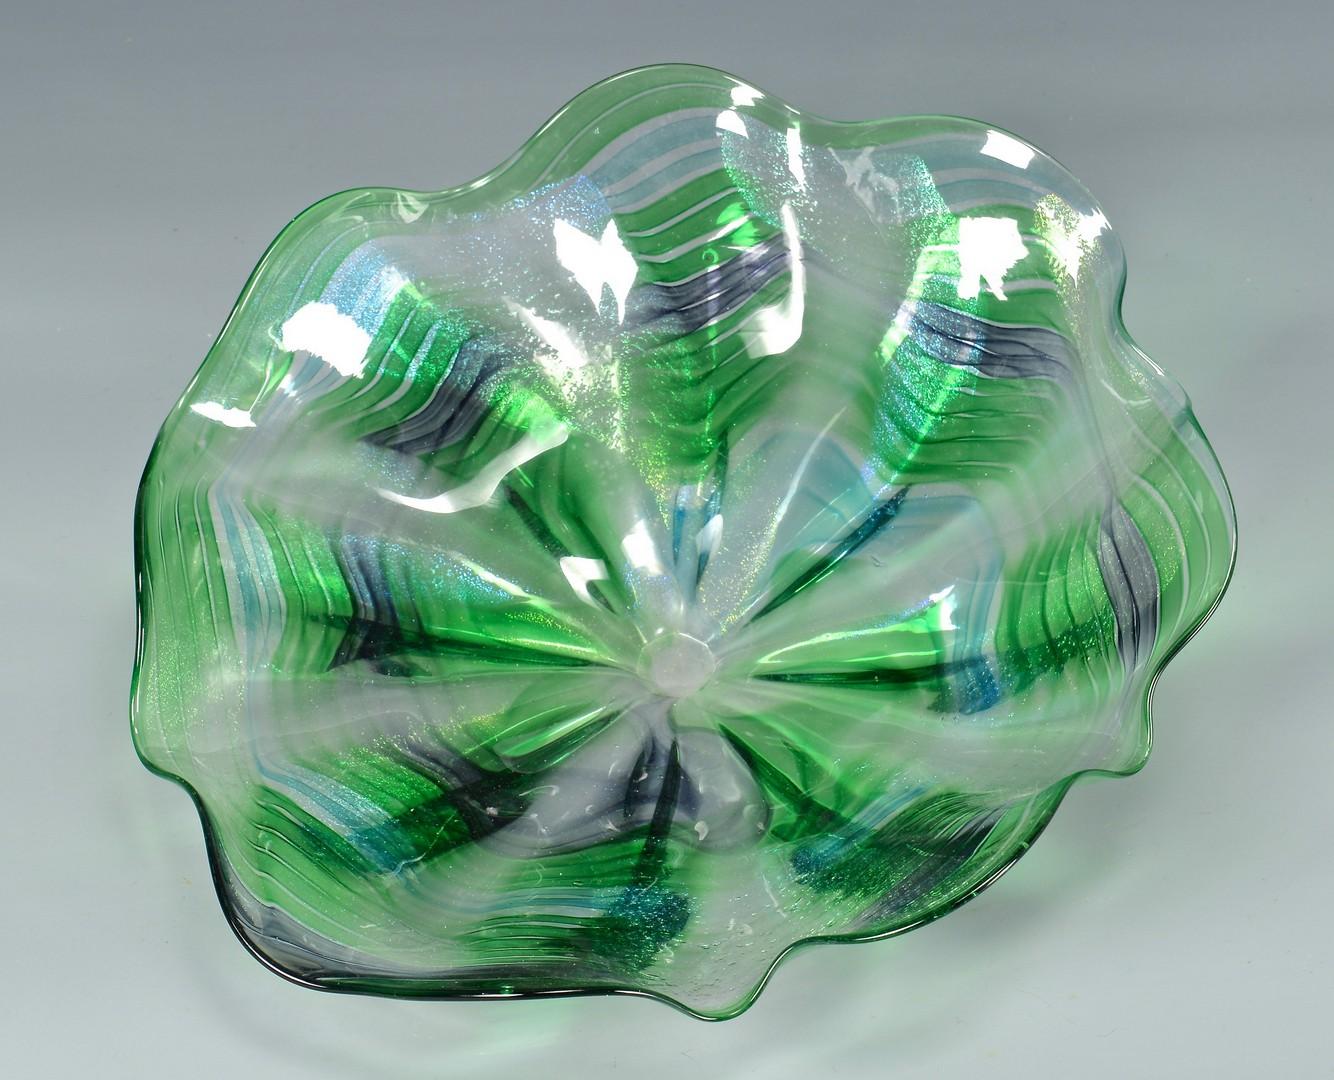 Lot 4010155: Group of Art Glass Items, 9 pcs.